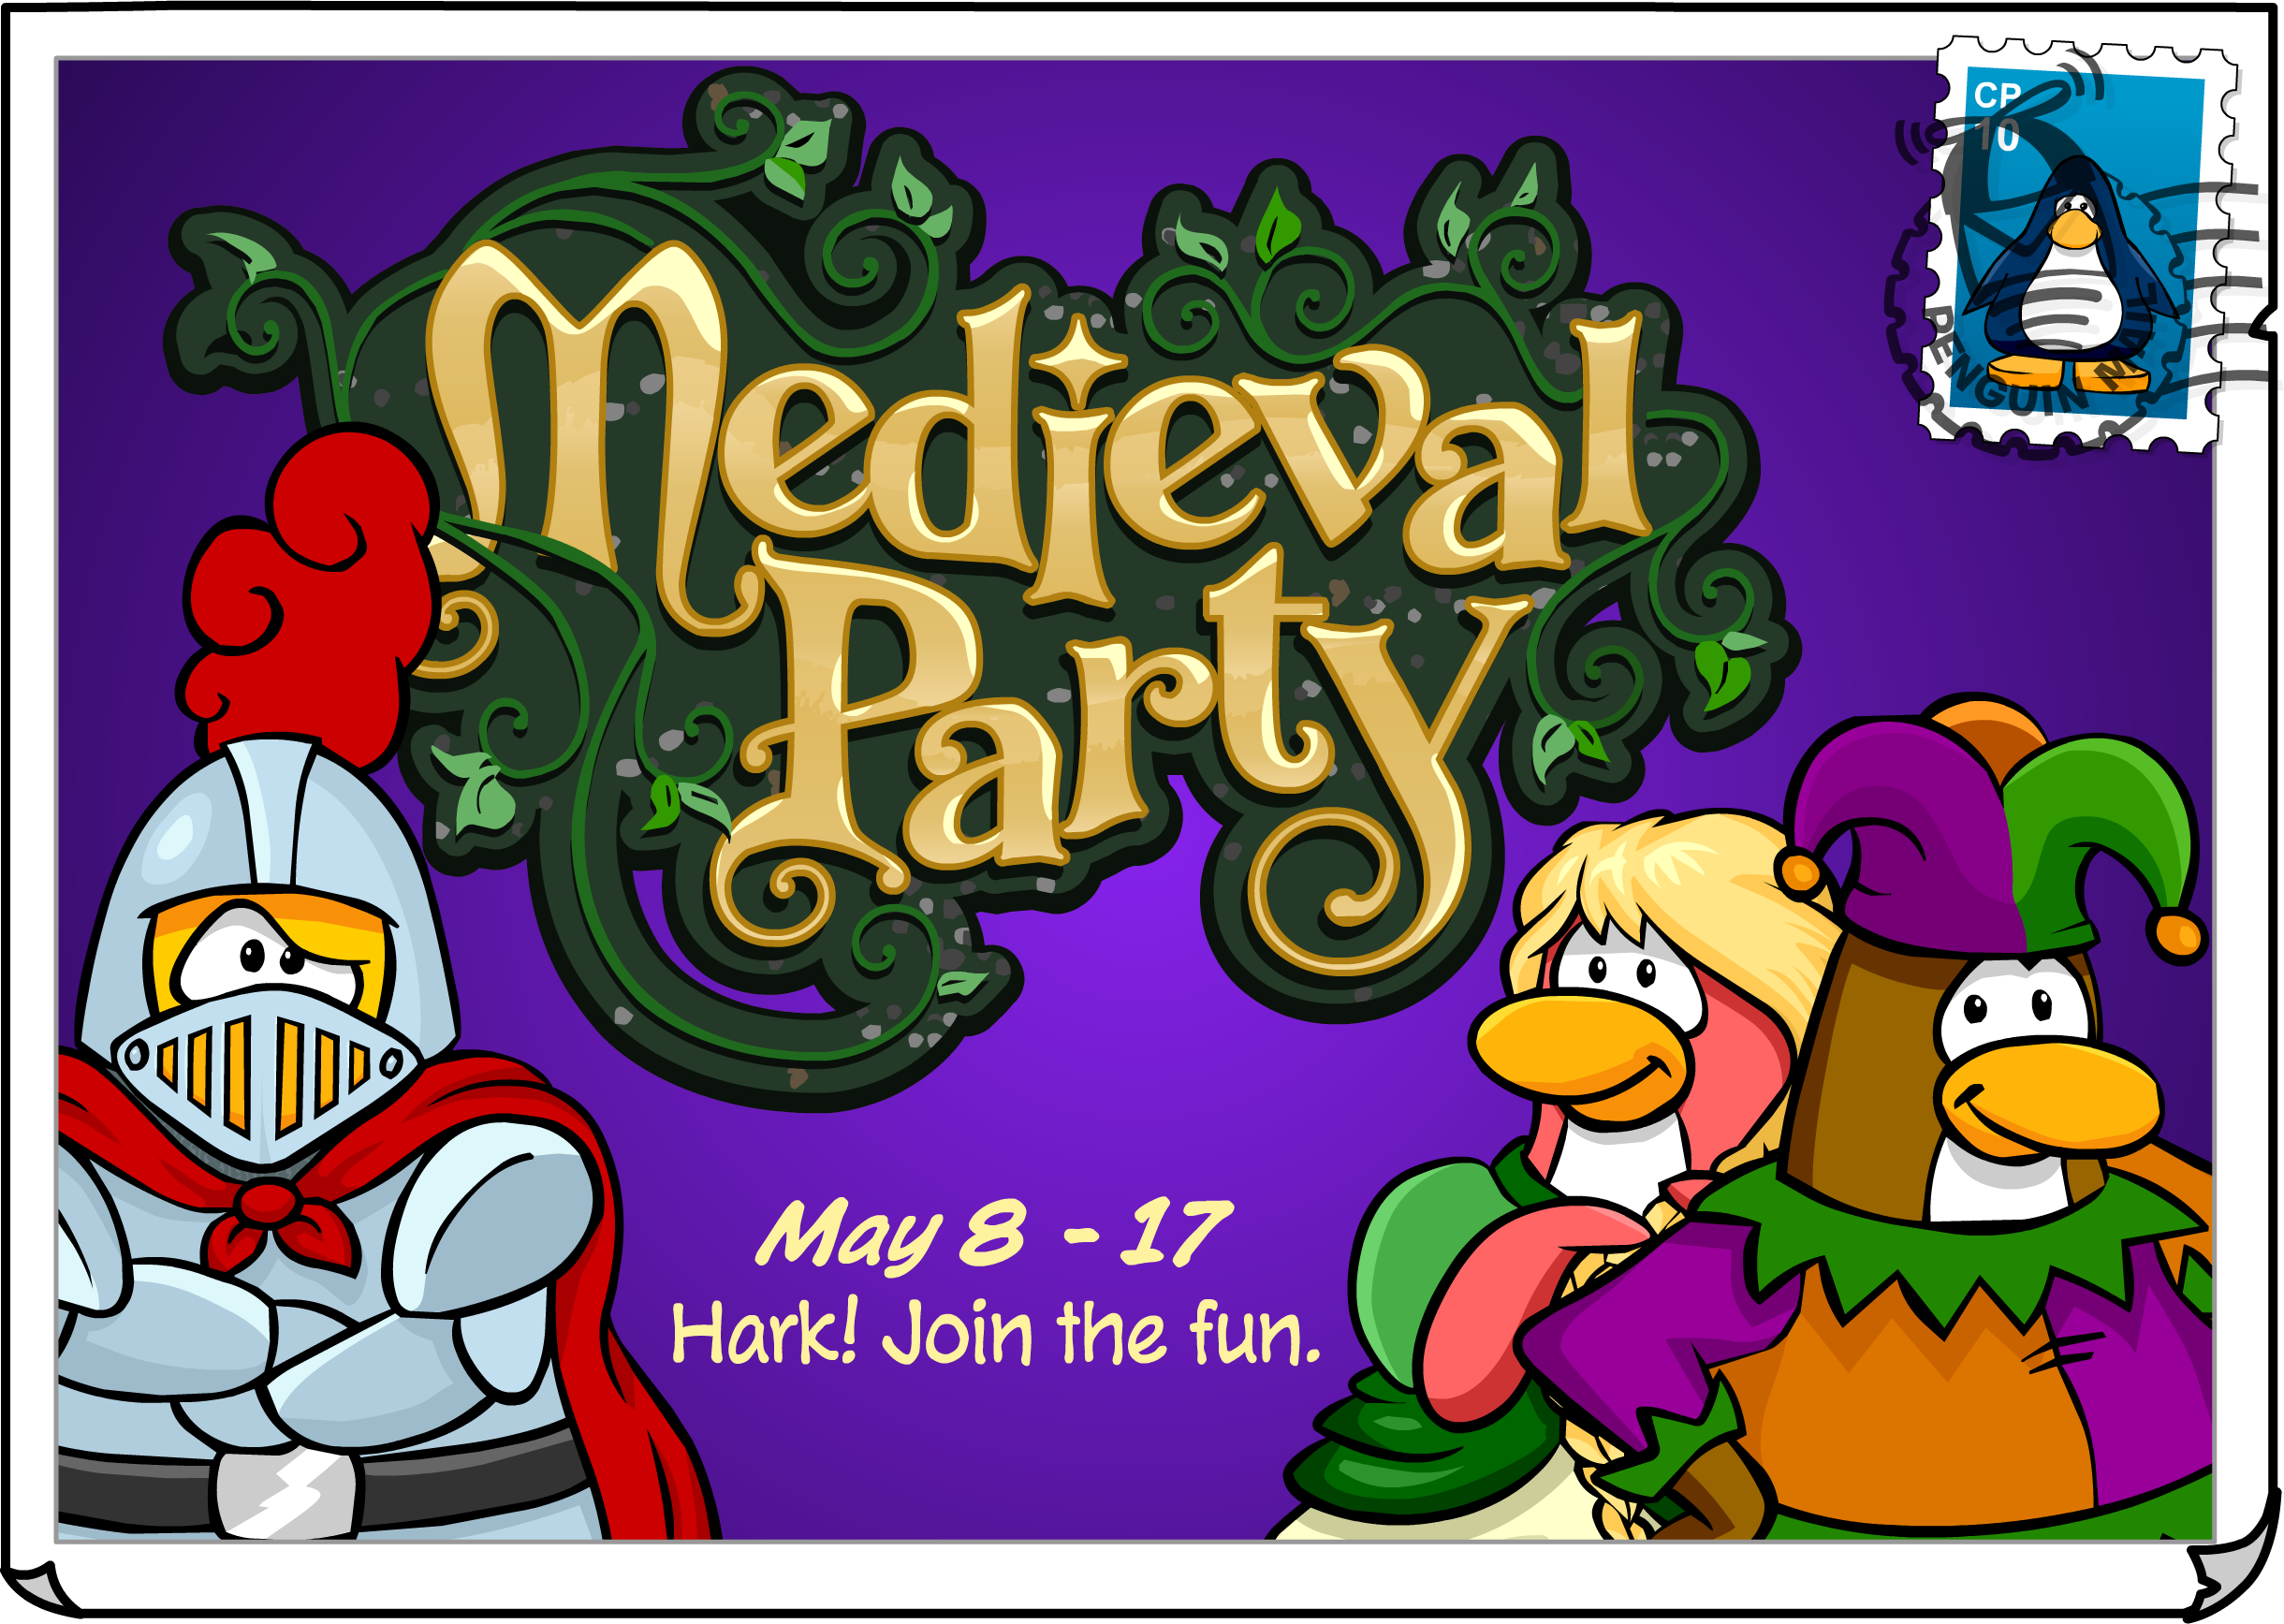 Medieval Party Postcard